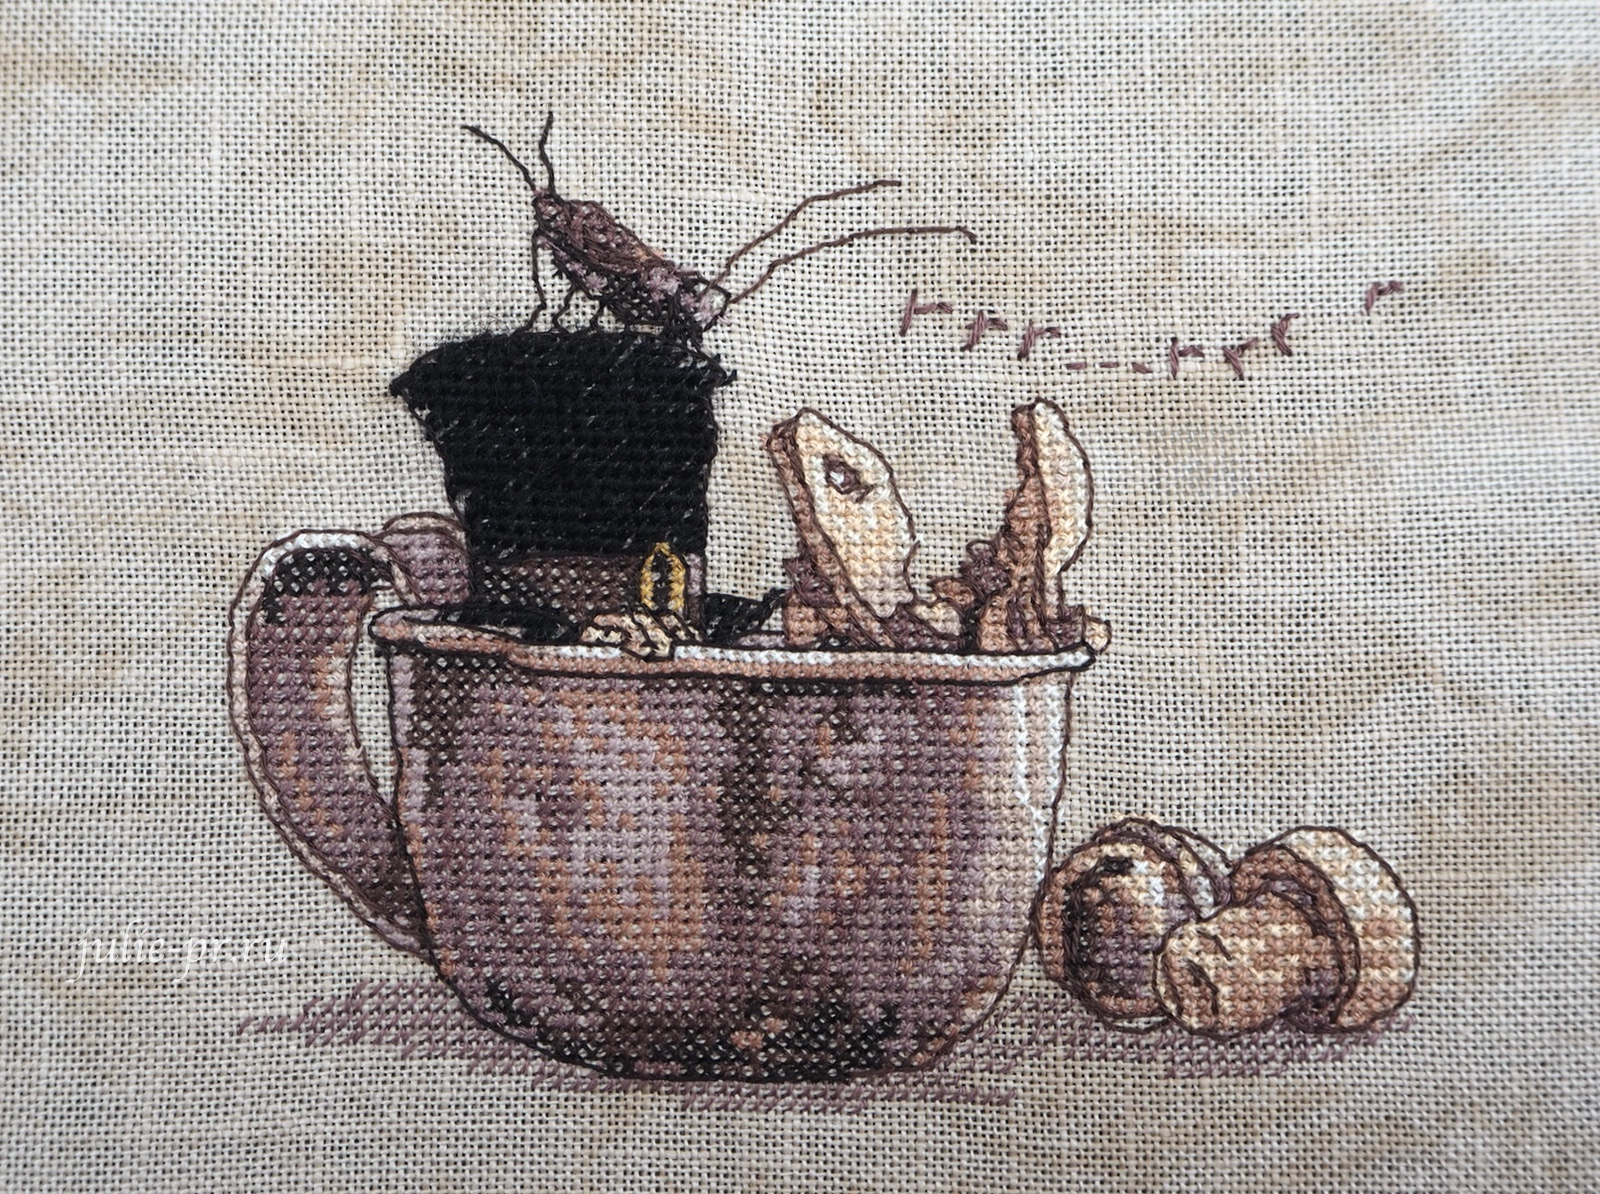 Nimue, Chapeau Ivre, Пьяная шляпа, Annaick Chauvel, Аннаик Шовель